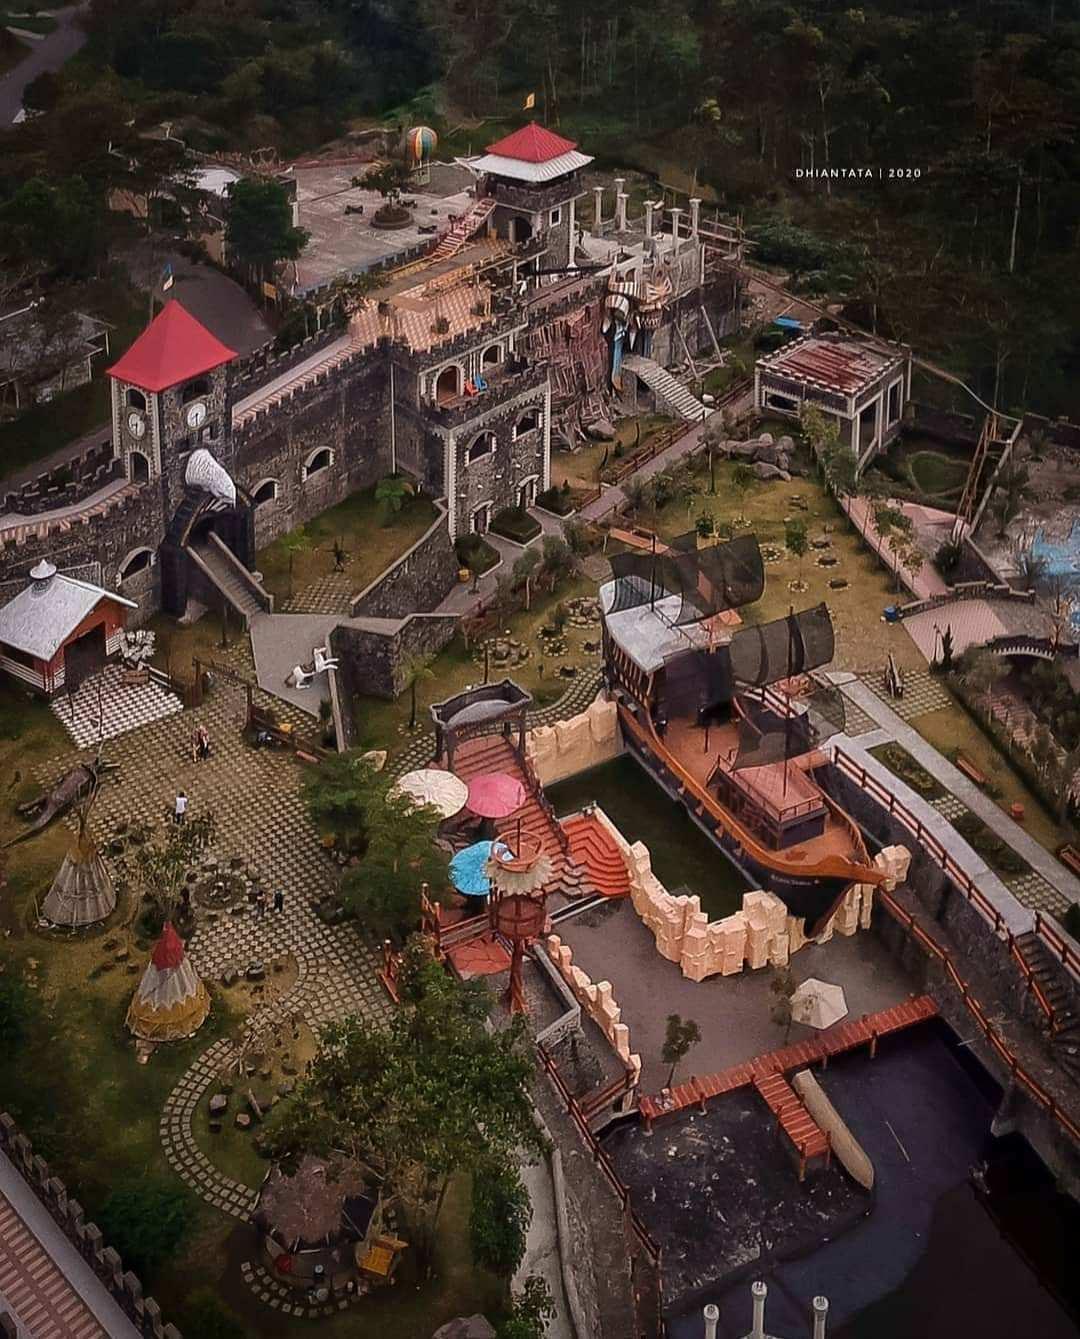 The Lost World Castle Jogja Dilihat Dari Atas Image From @dhian_hardjodisastro